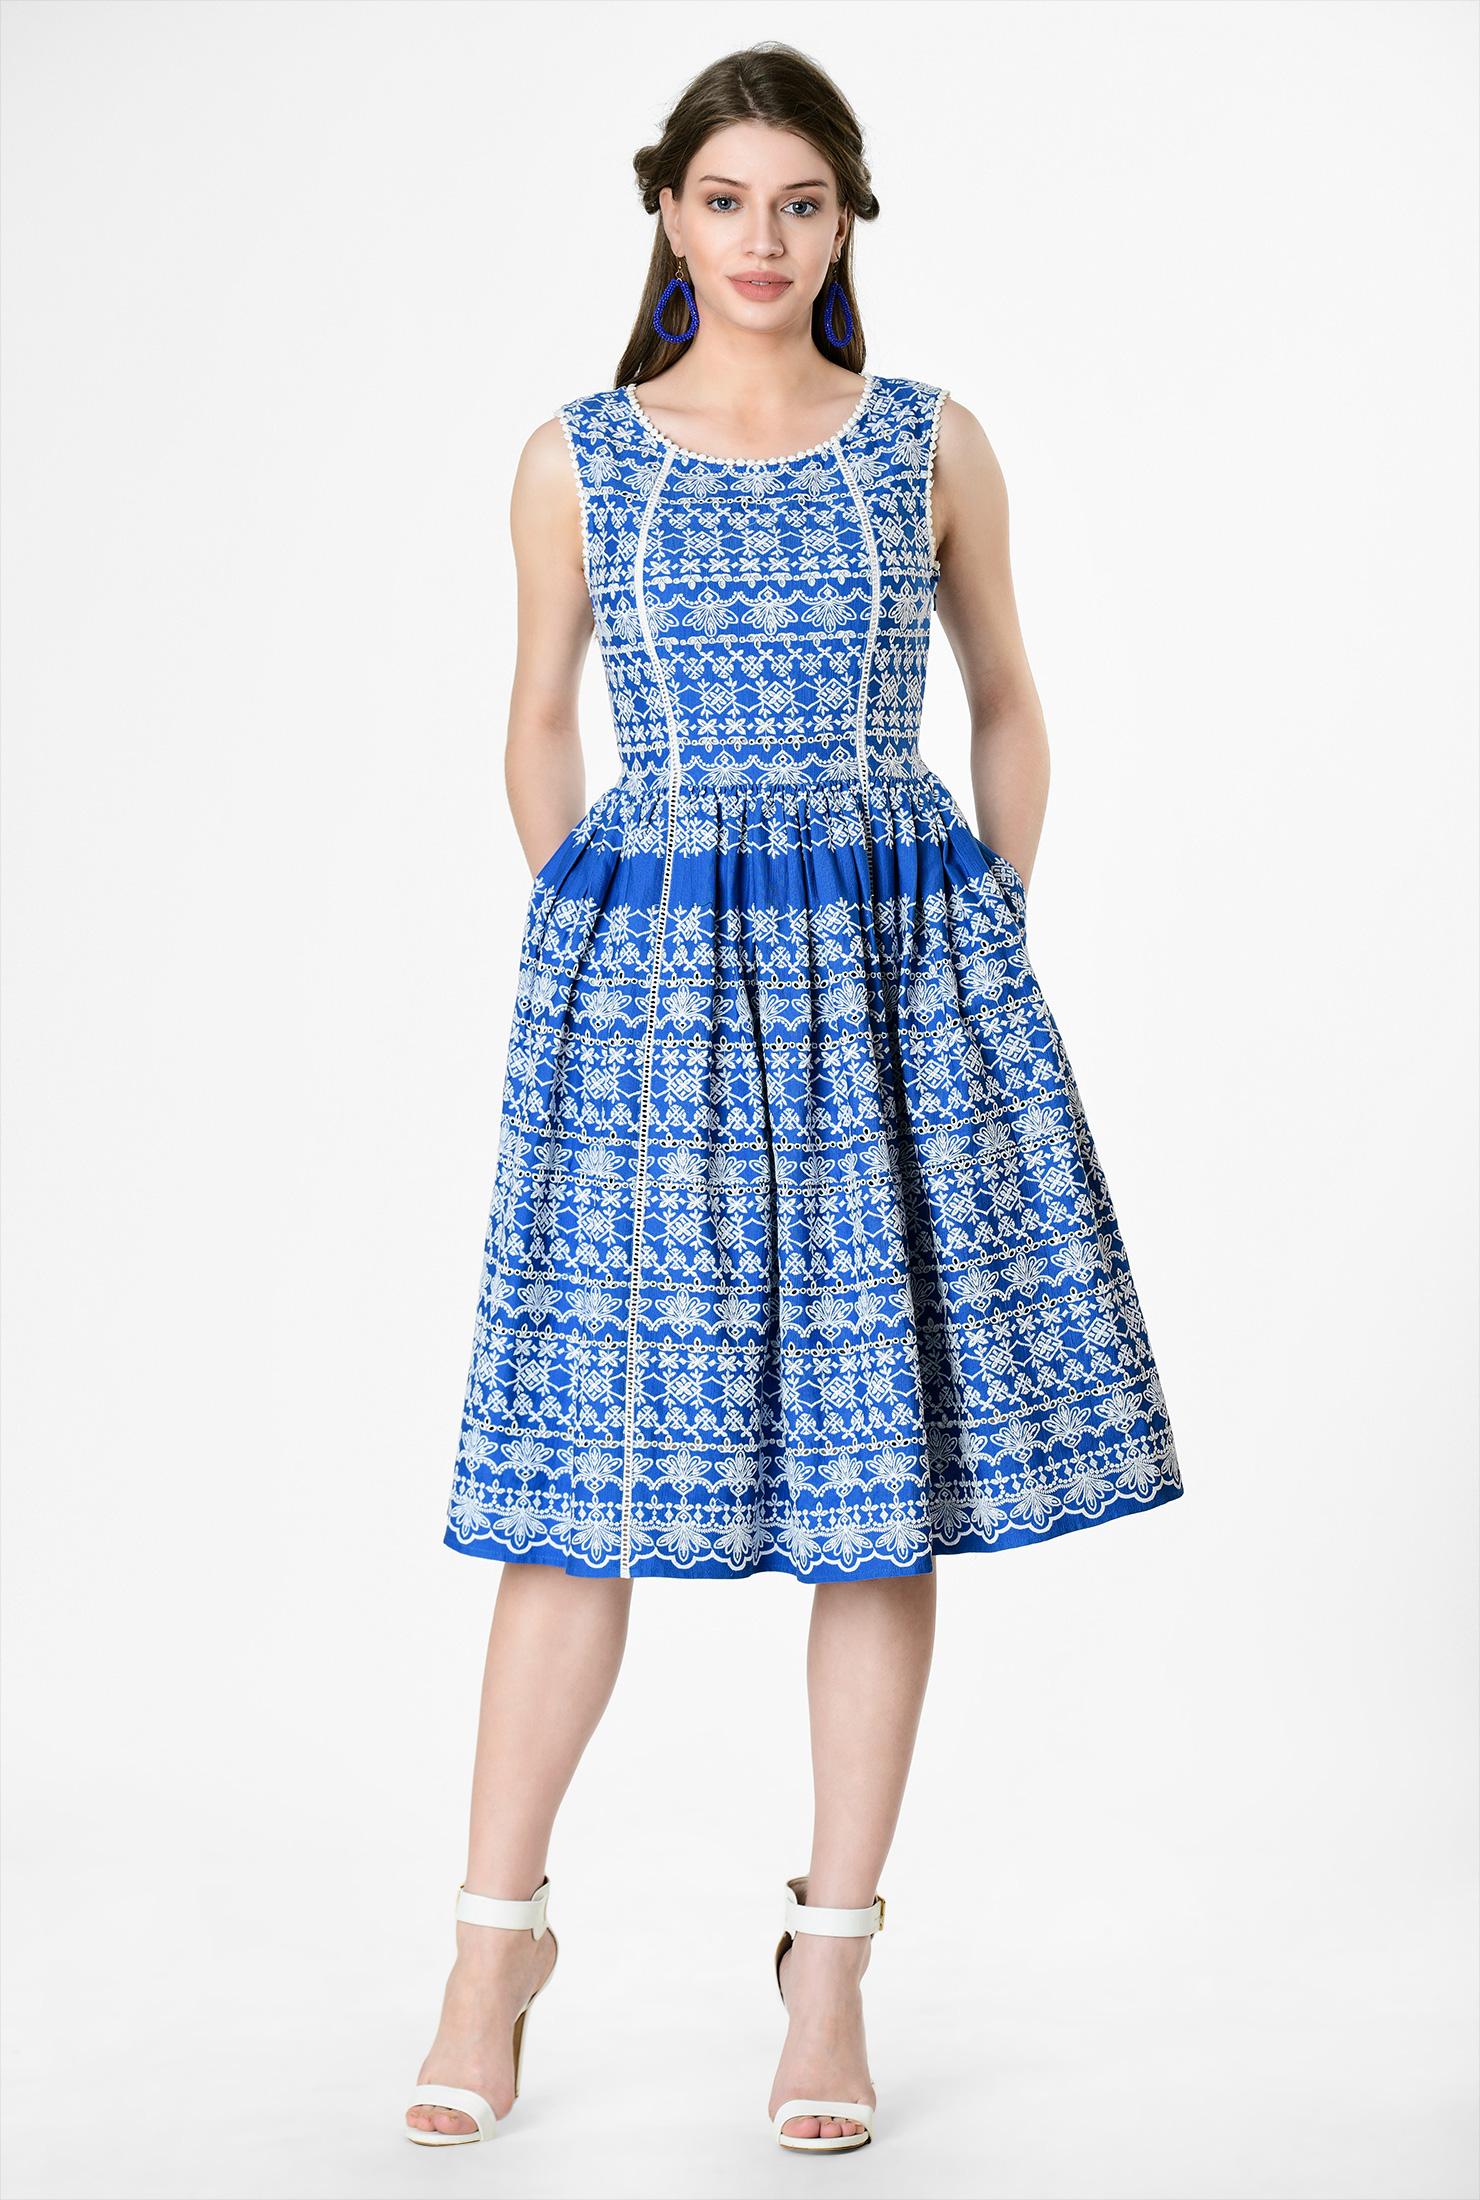 bf68aabca86 Women s Fashion Clothing 0-36W and Custom